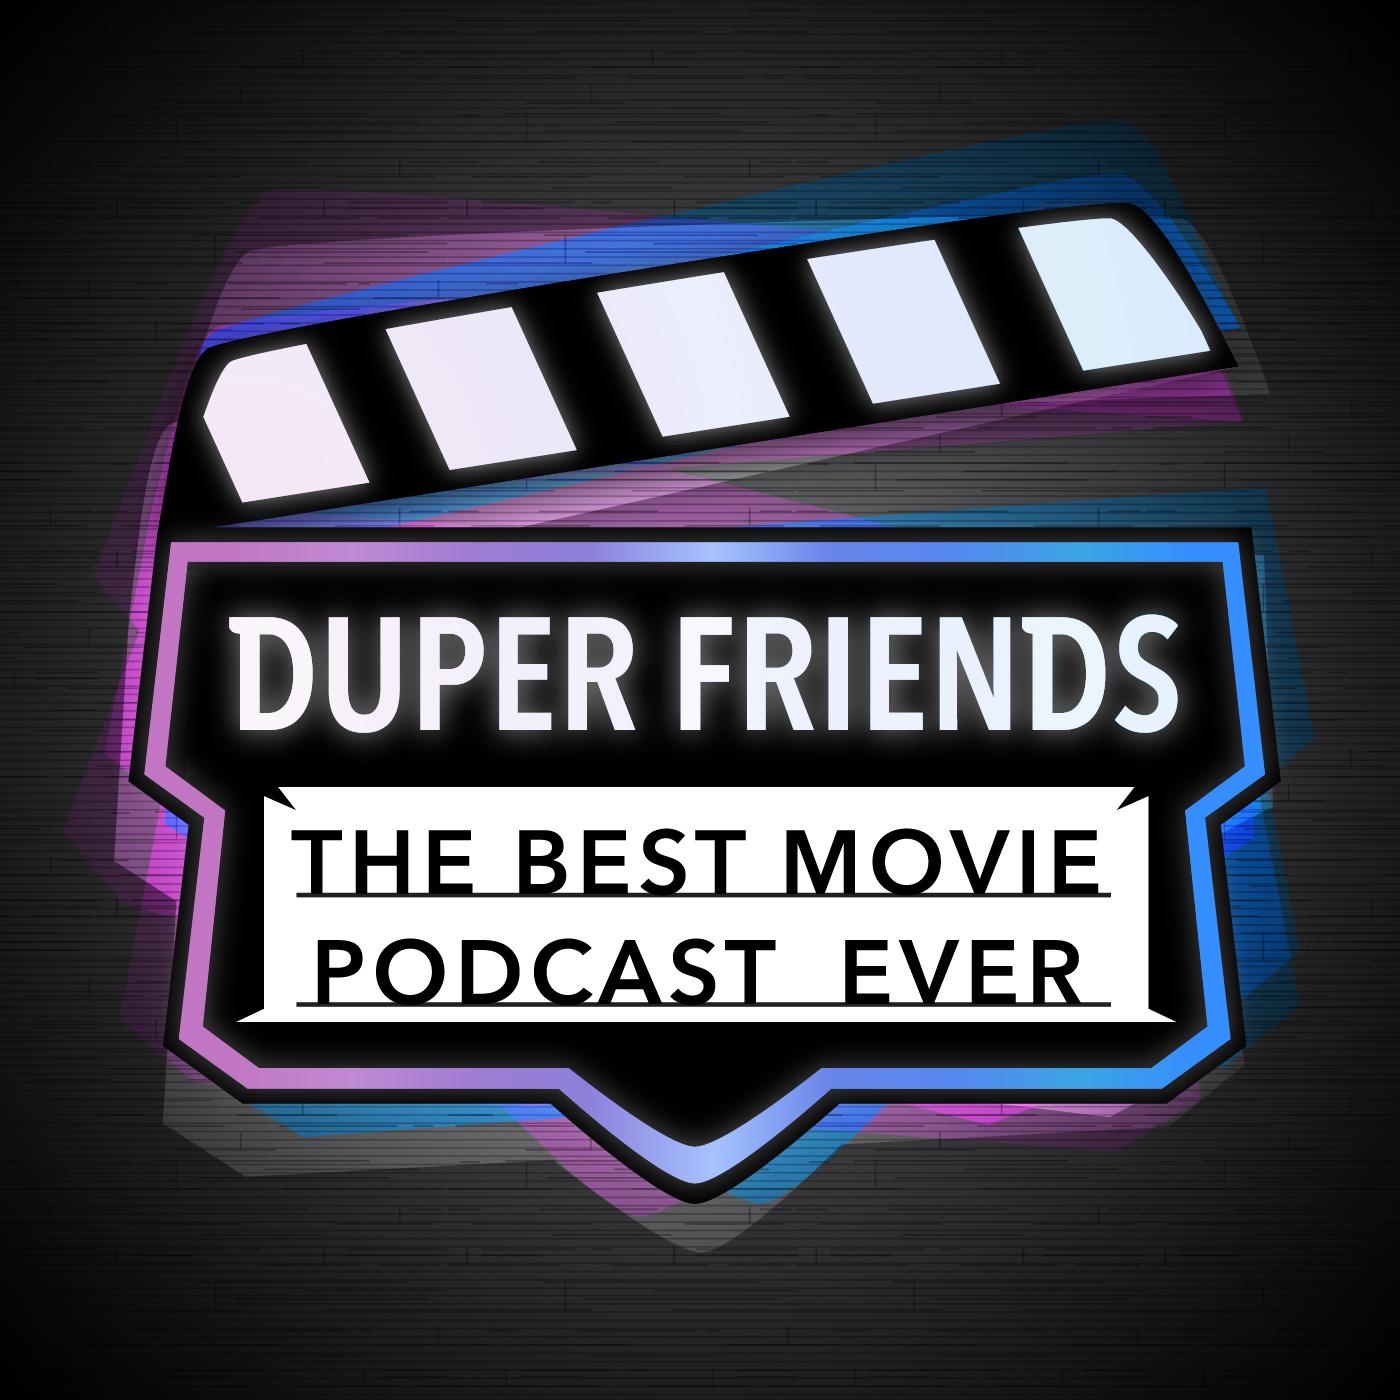 duper-friends-podcast